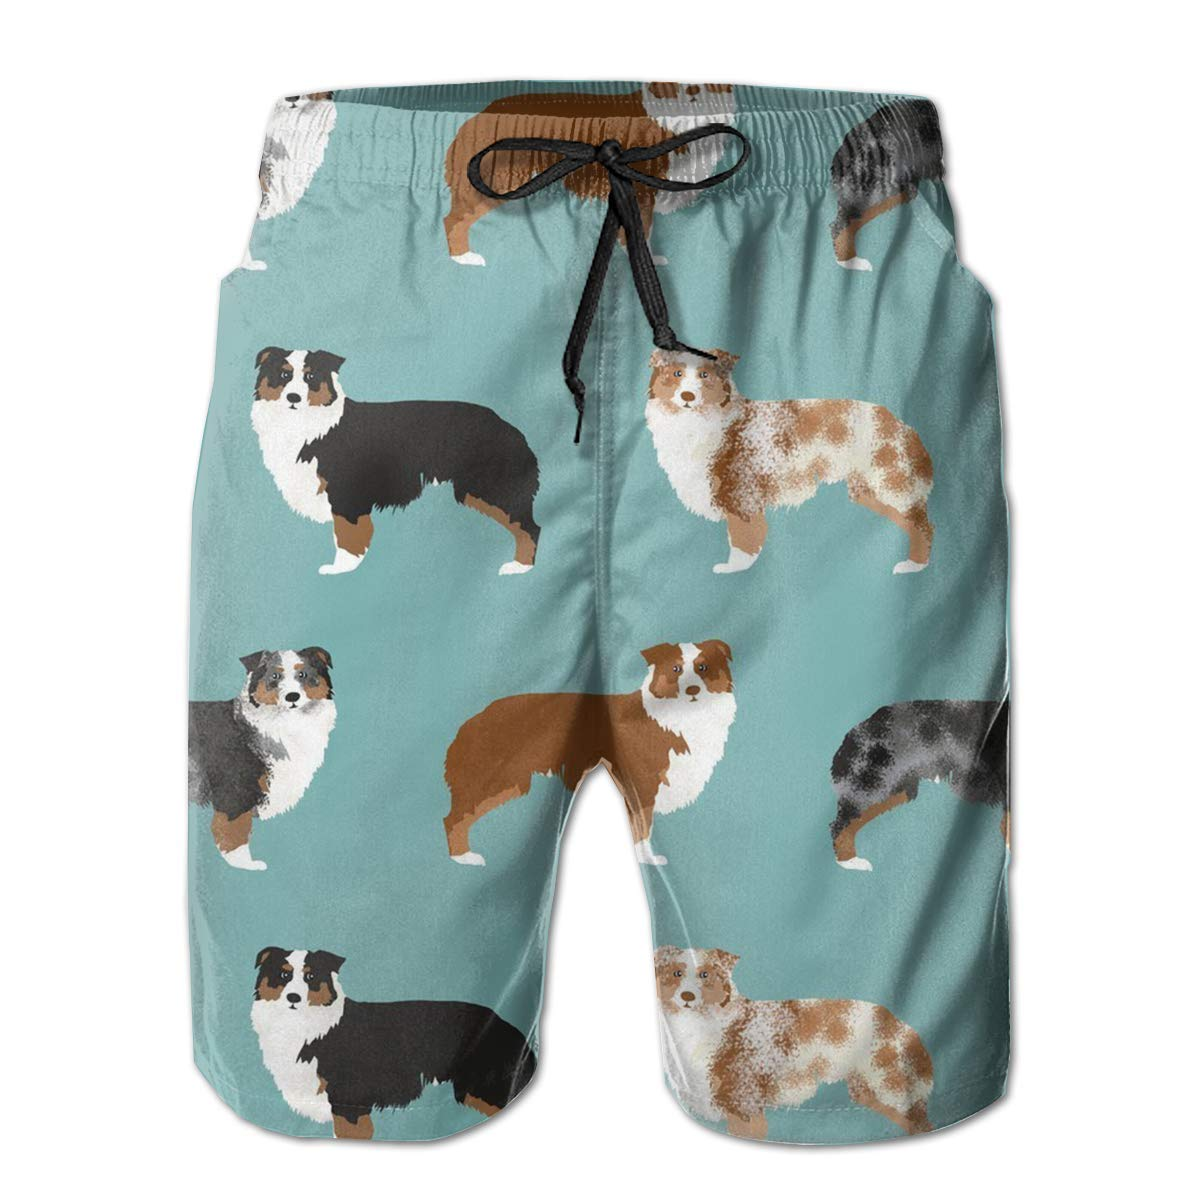 Mens 3D Print Australian Shepherds Dogs Casual Classic Drawstring Loose Fit Trunks Boardshort Shorts